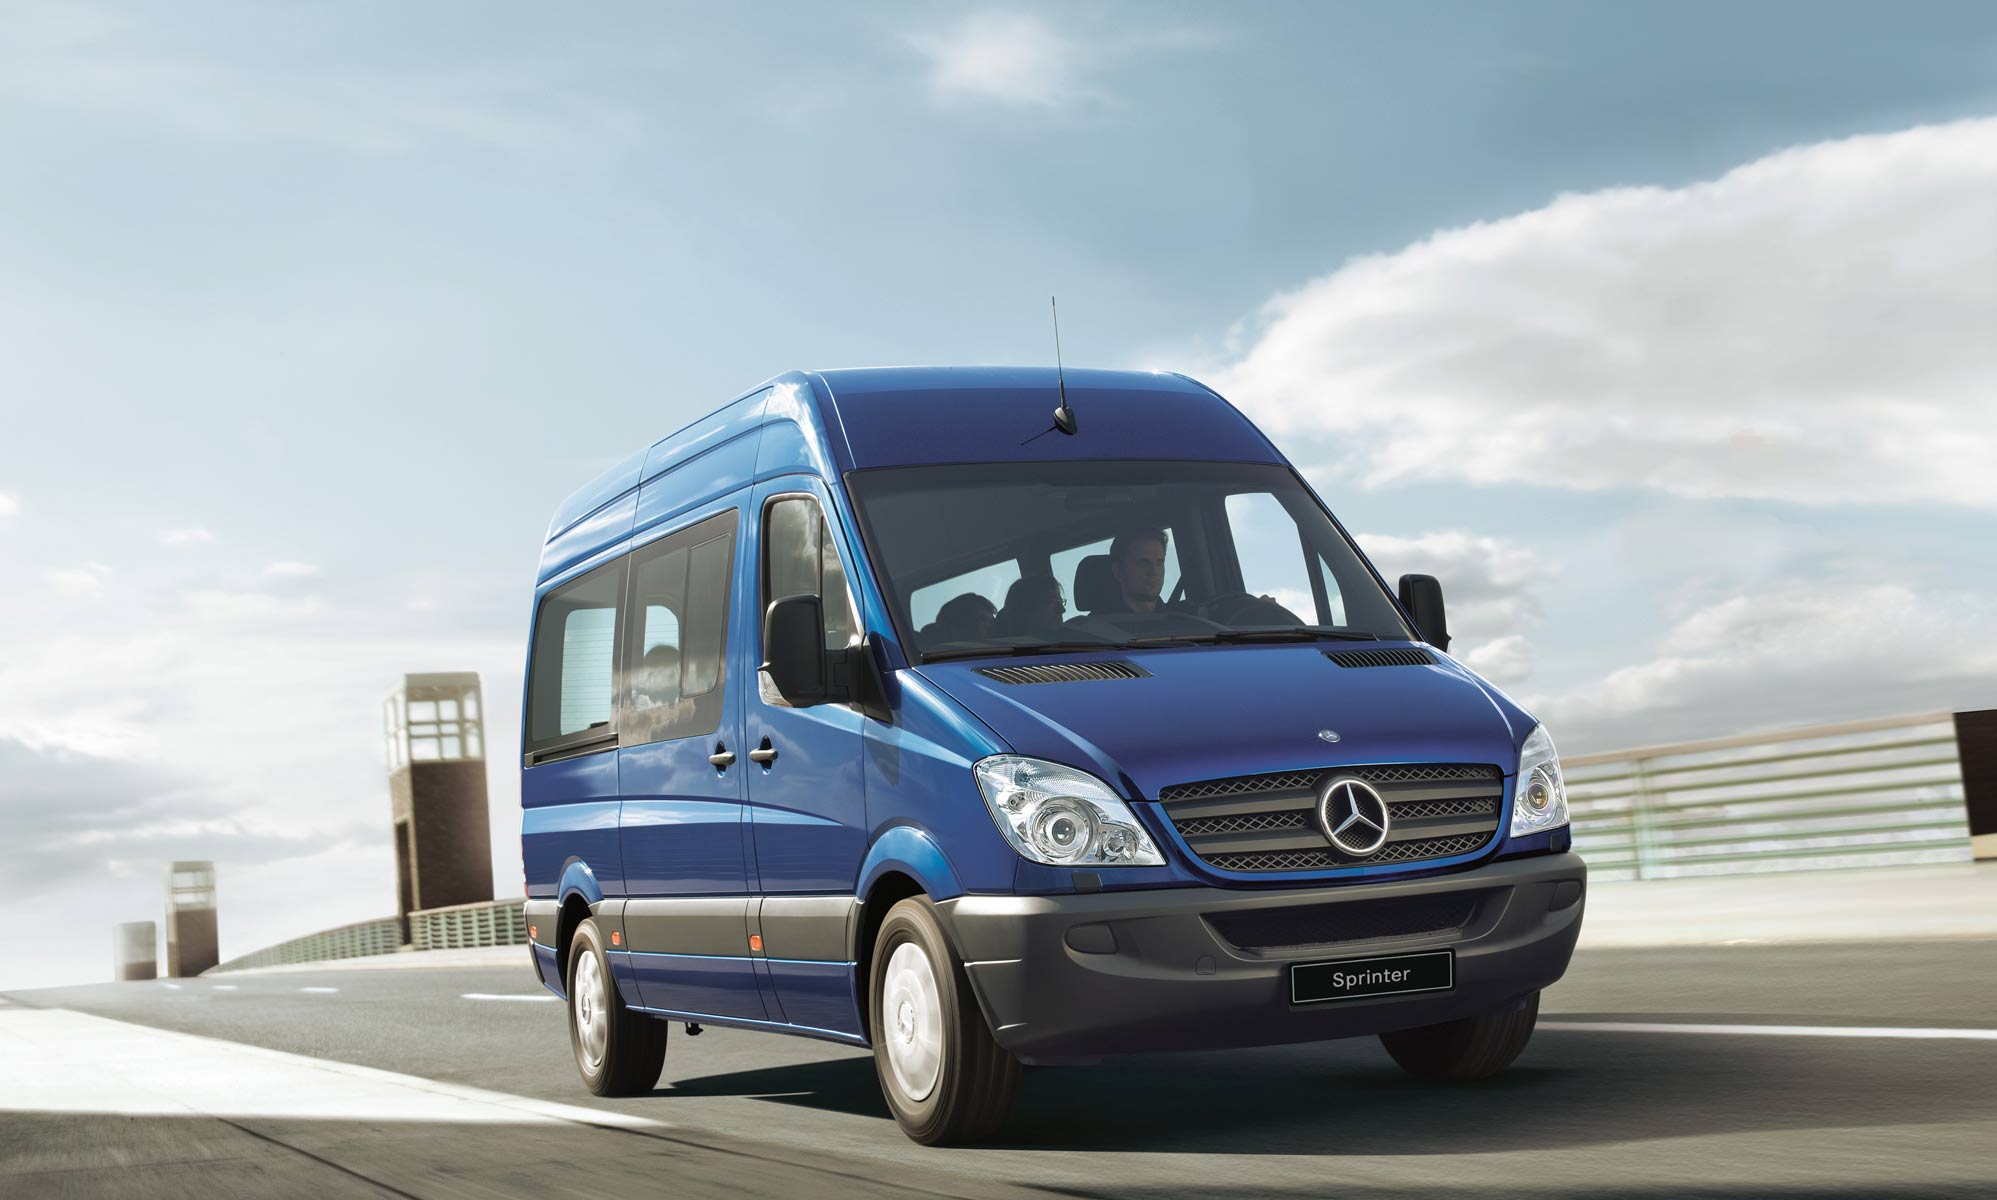 Mercedes-Benz Sprinter. Ремонт 4-х опорного карданного вала